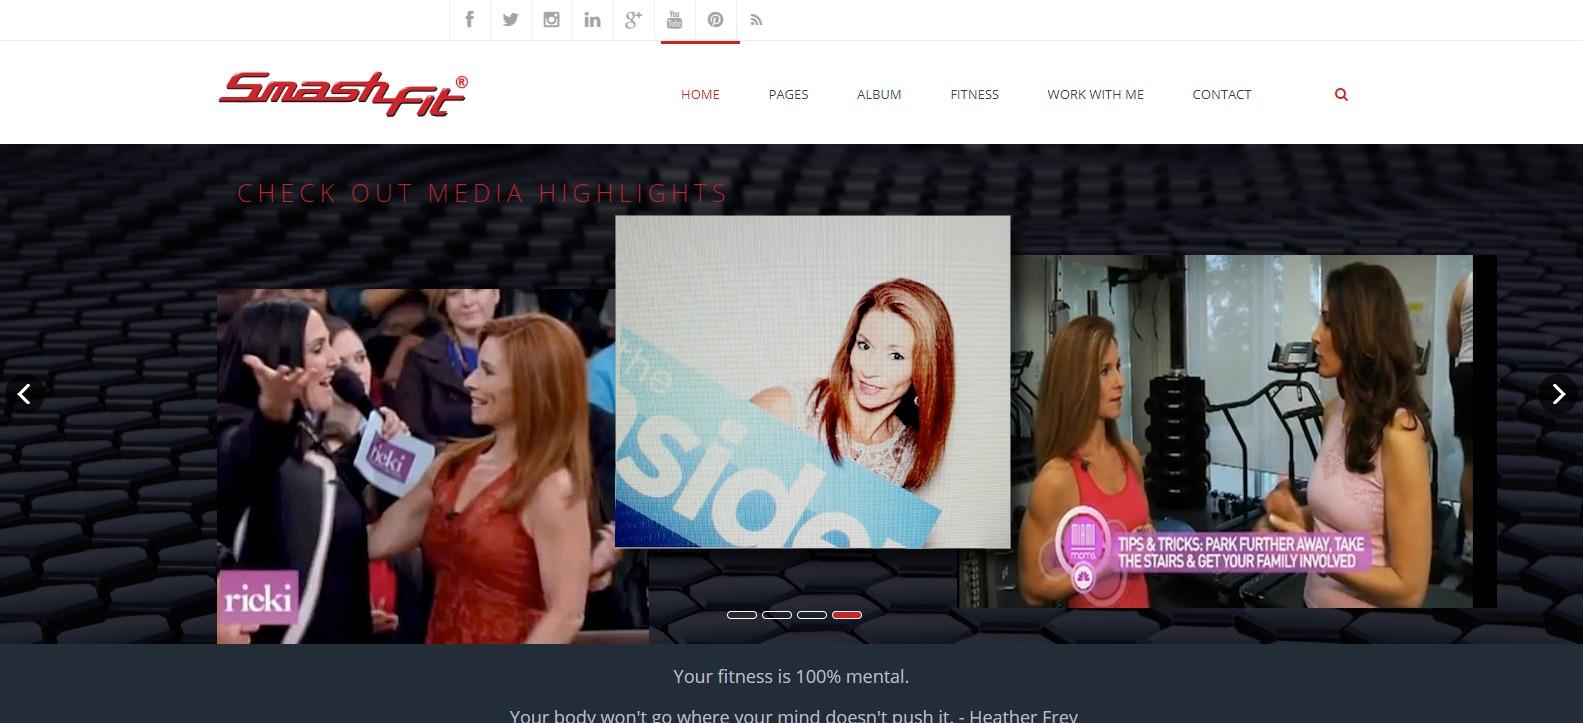 Smashfit online fitness website